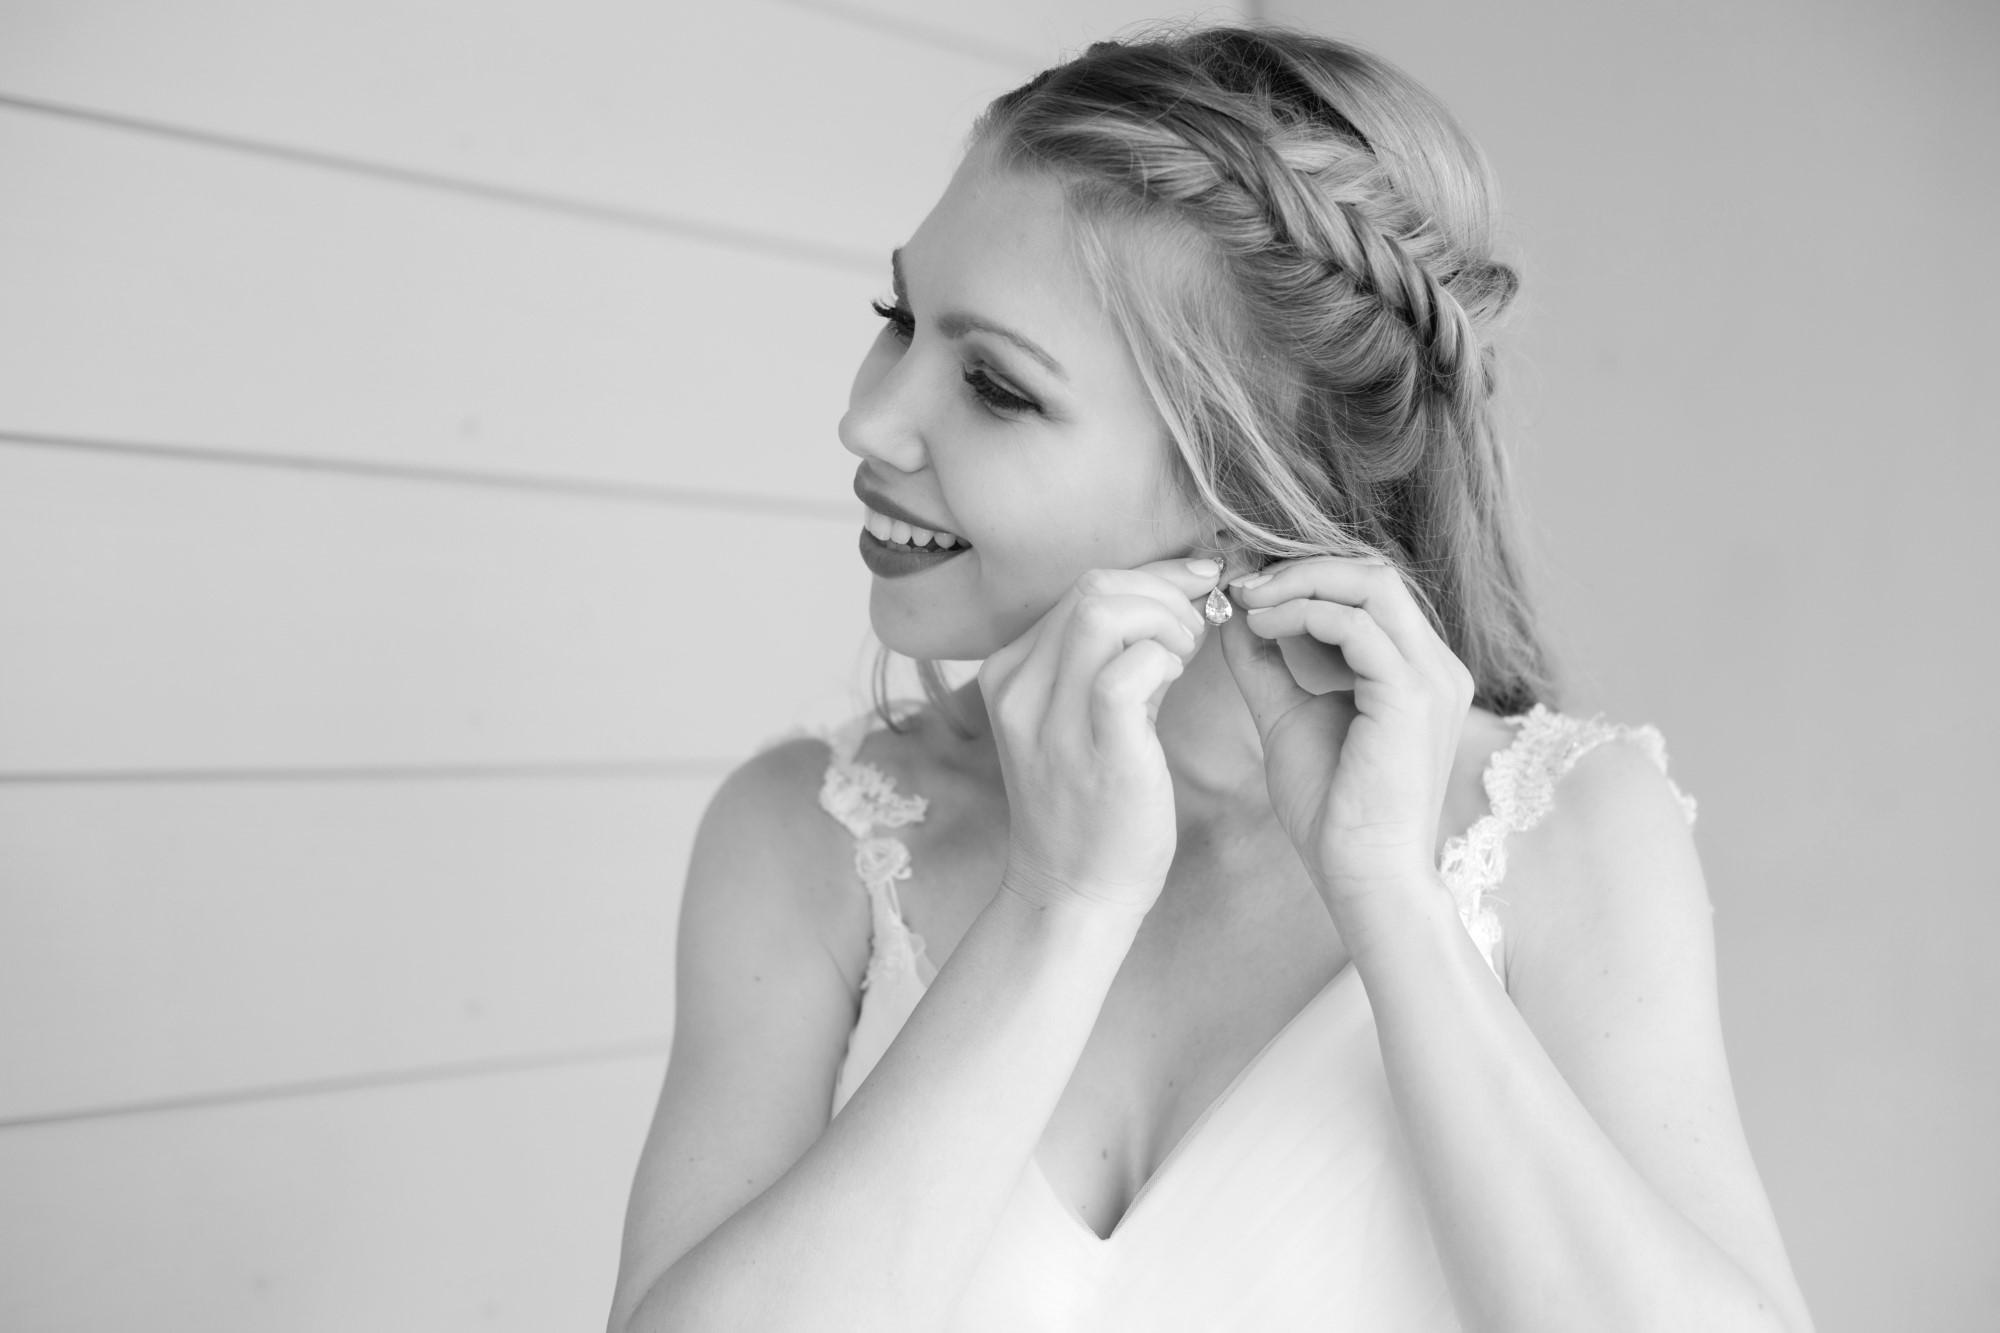 Braut steckt sich den Ohrring an - Getting Ready der Braut